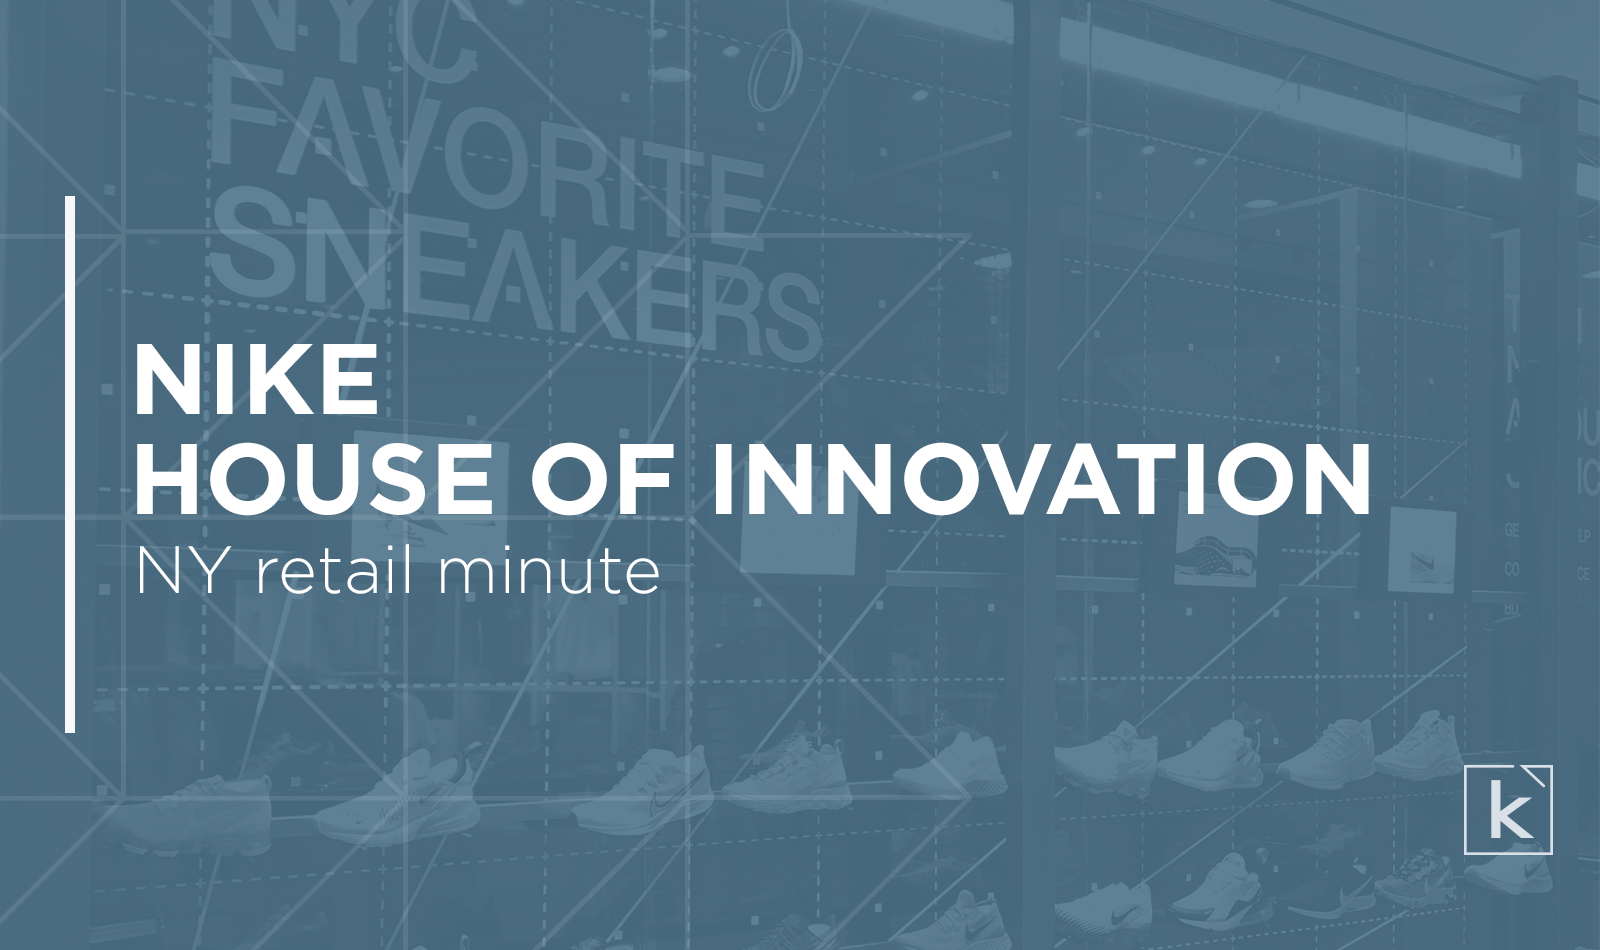 nike-house-of-innovation-ny-retail-minute